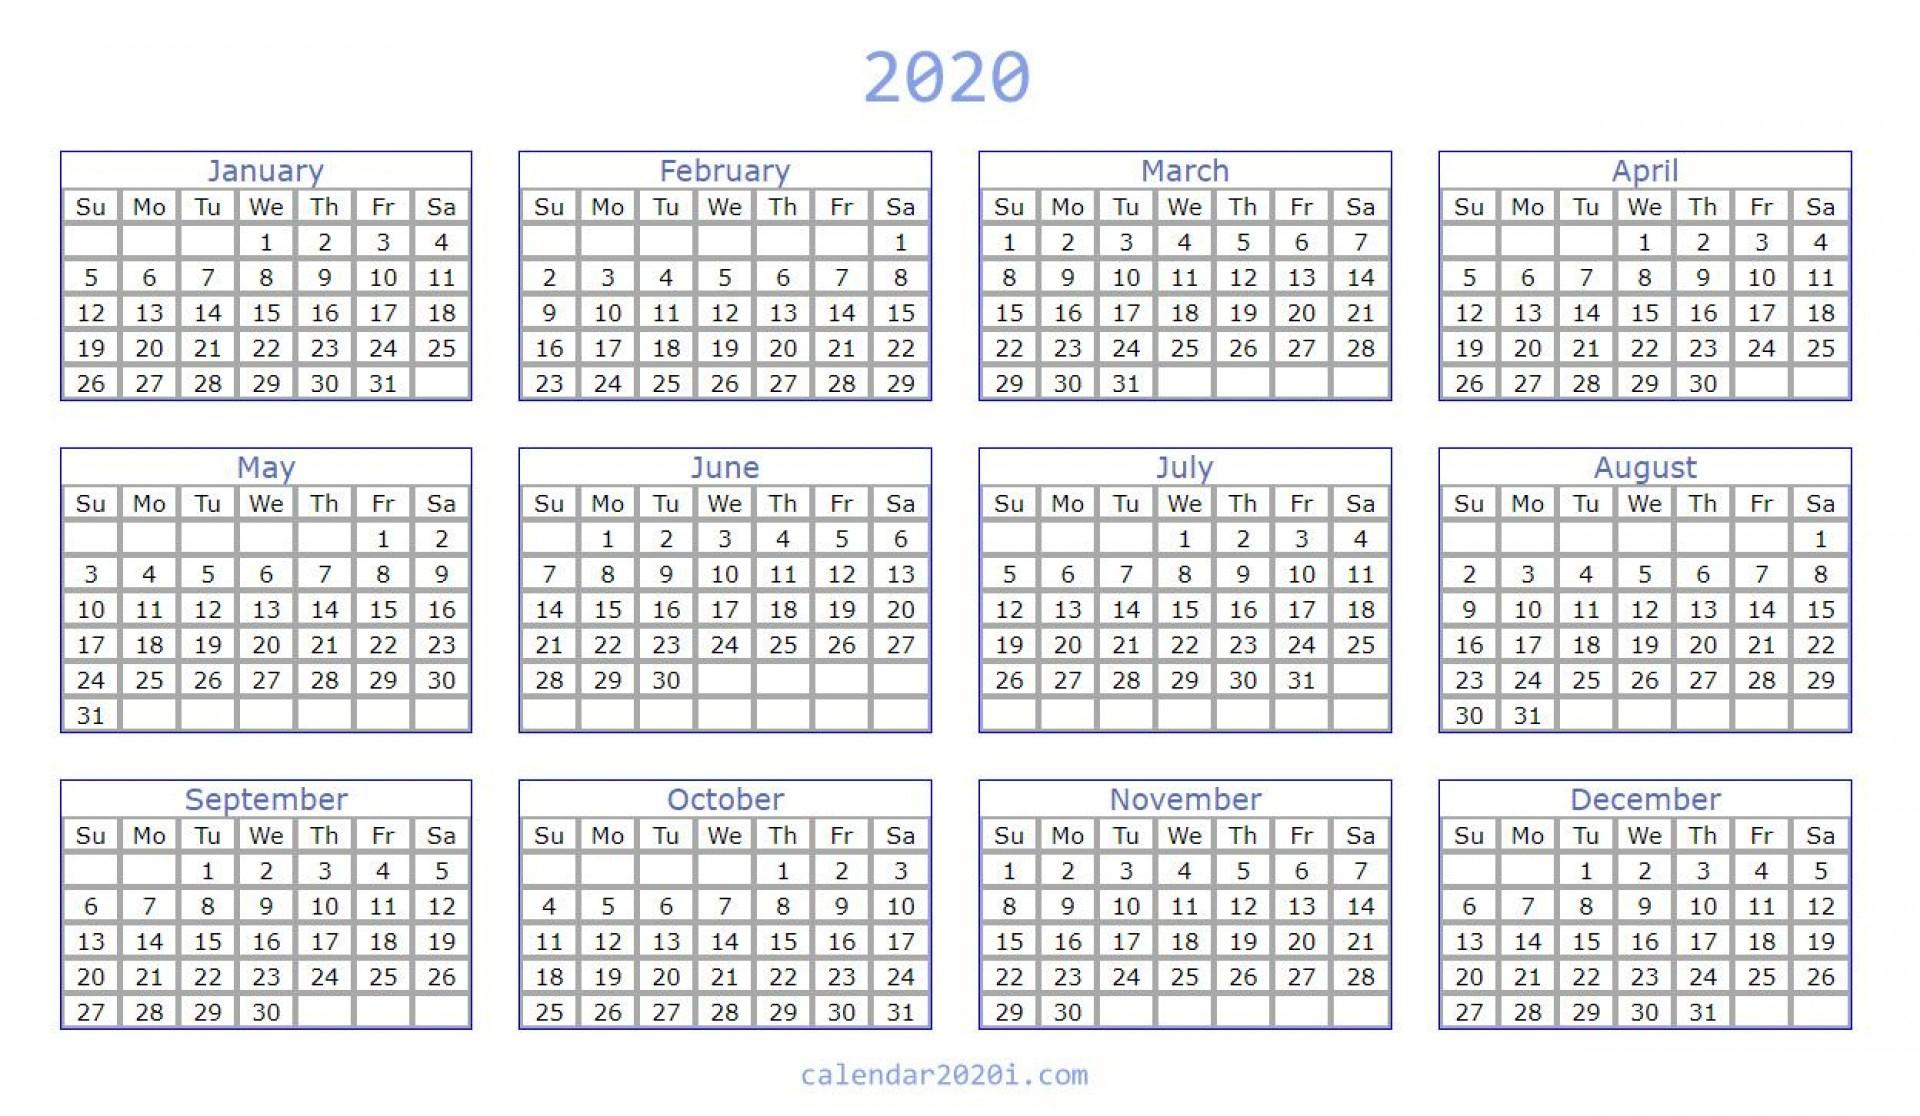 003 Wincalendars Calendar Template For Word Remarkable Ideas with Printable 2007 Calendar